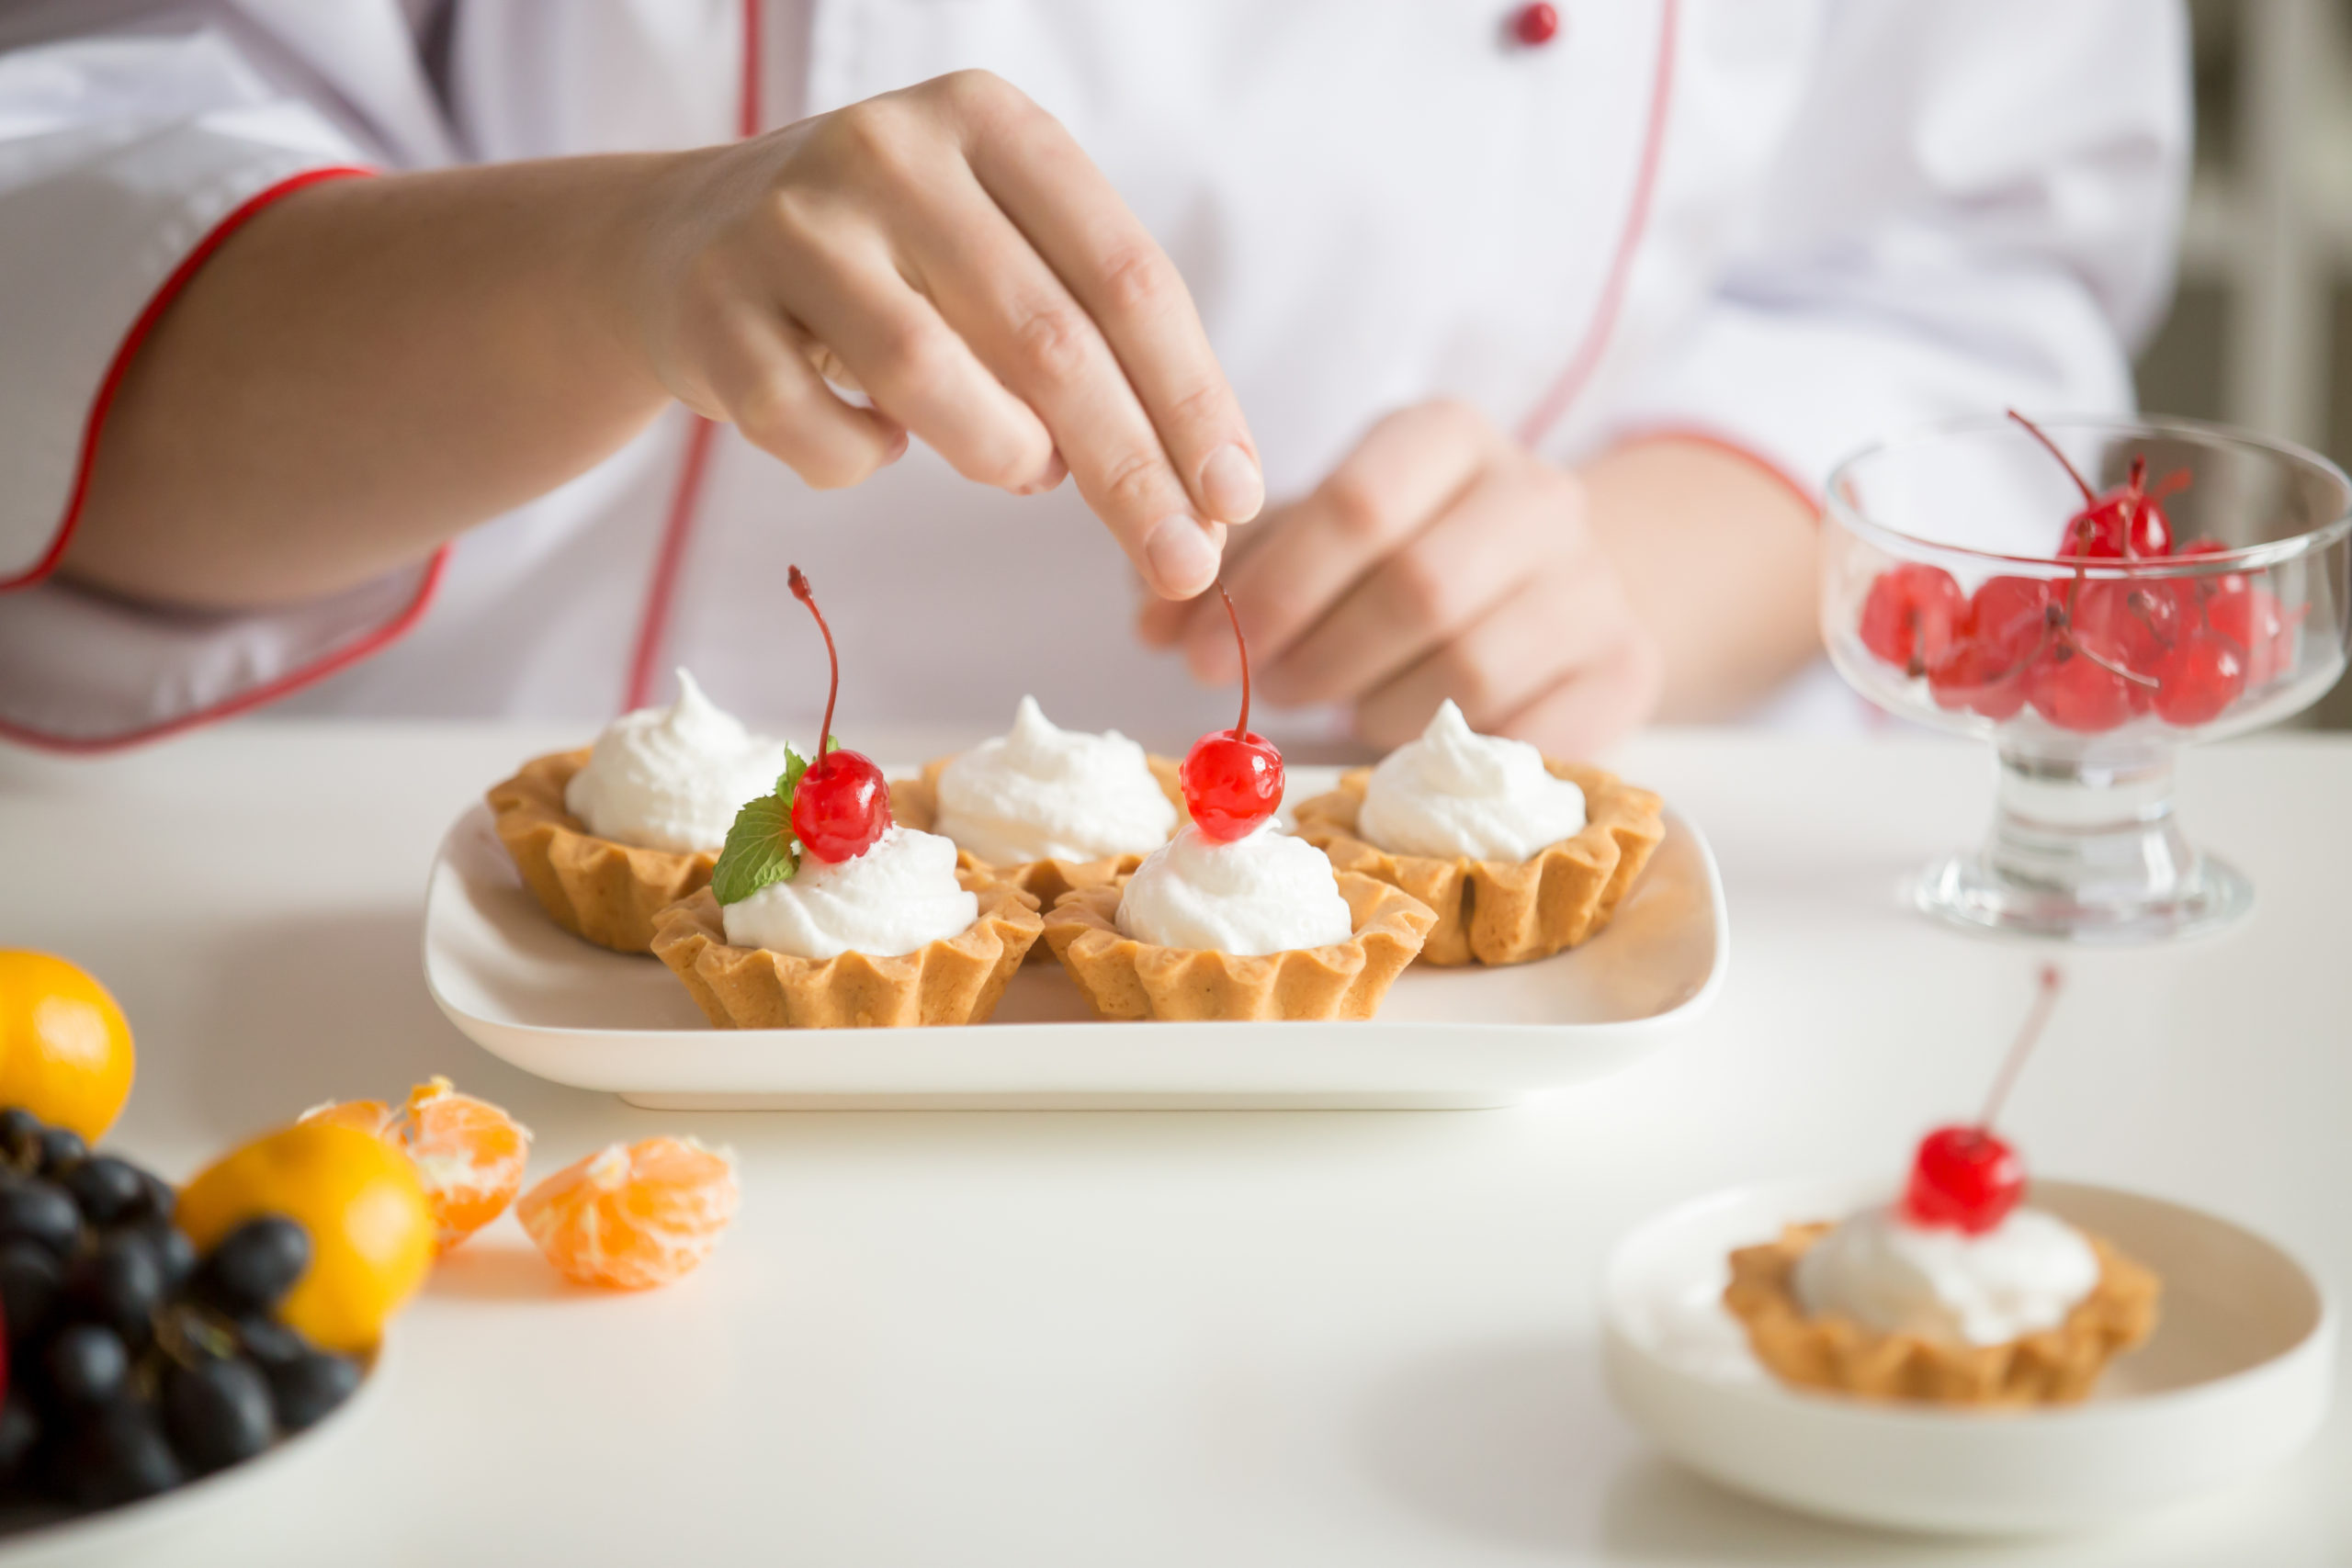 Pâtisserie healthy - tendance pâtisserie